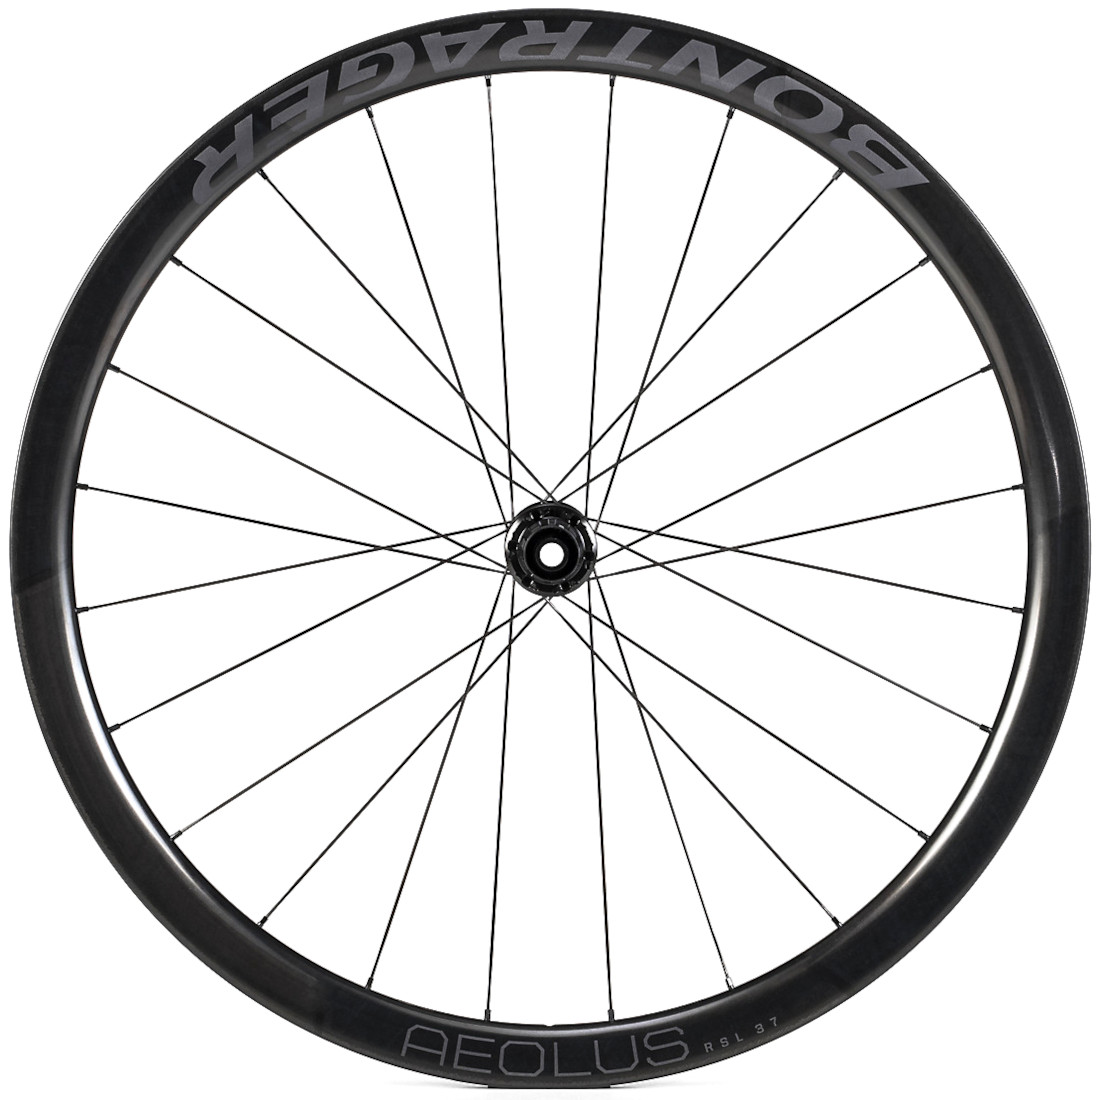 Bontrager Aeolus RSL 37 TLR Road Rear Wheel - Clincher - Centerlock - 12x135/142mm